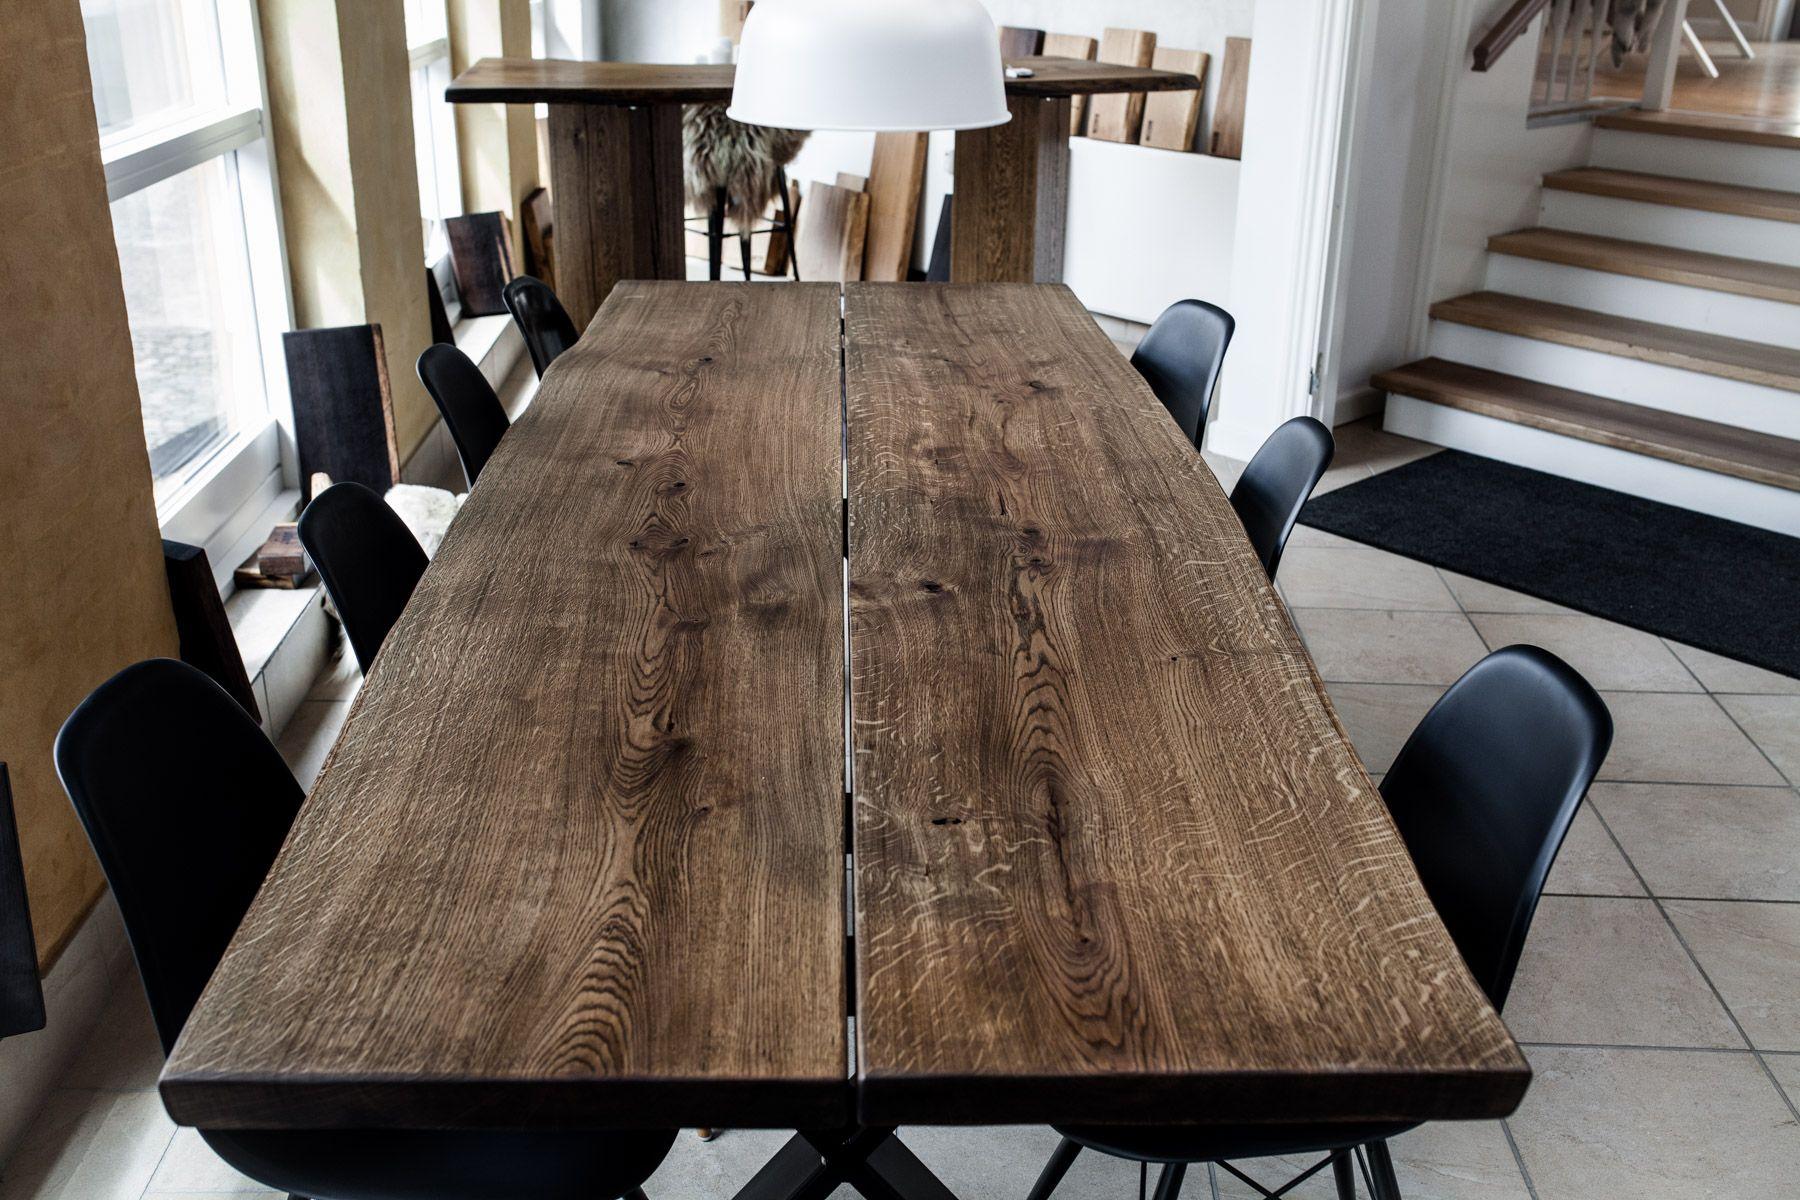 15bfbe05d4cd9ea41429f2a9b906f811 Luxe De Table Basse Montagne Concept